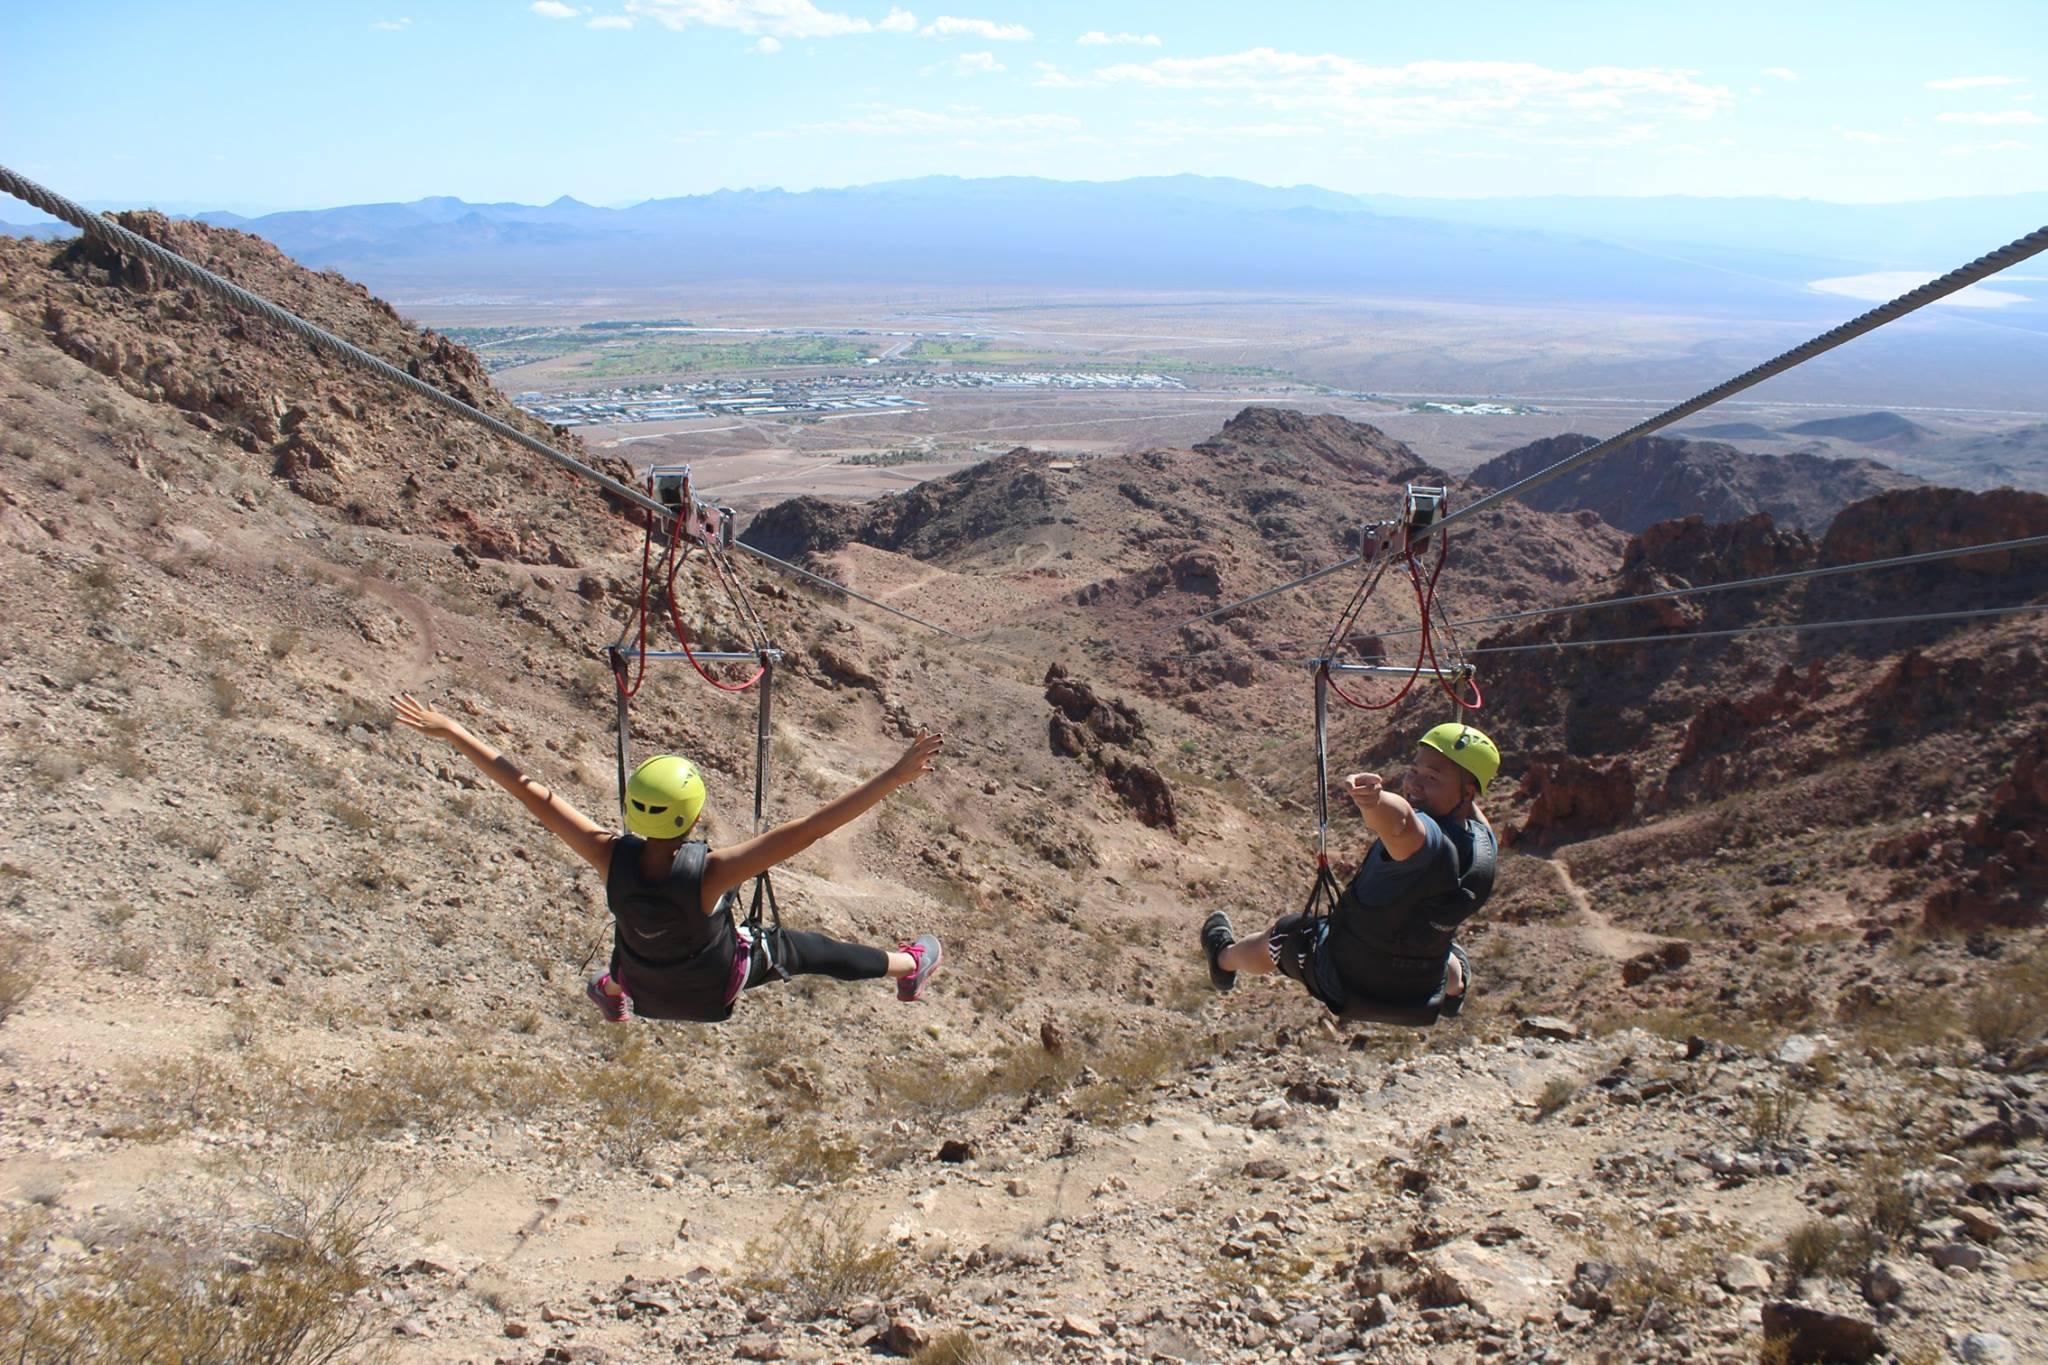 Zip-lining down Bootleg Canyon with Flightlinez